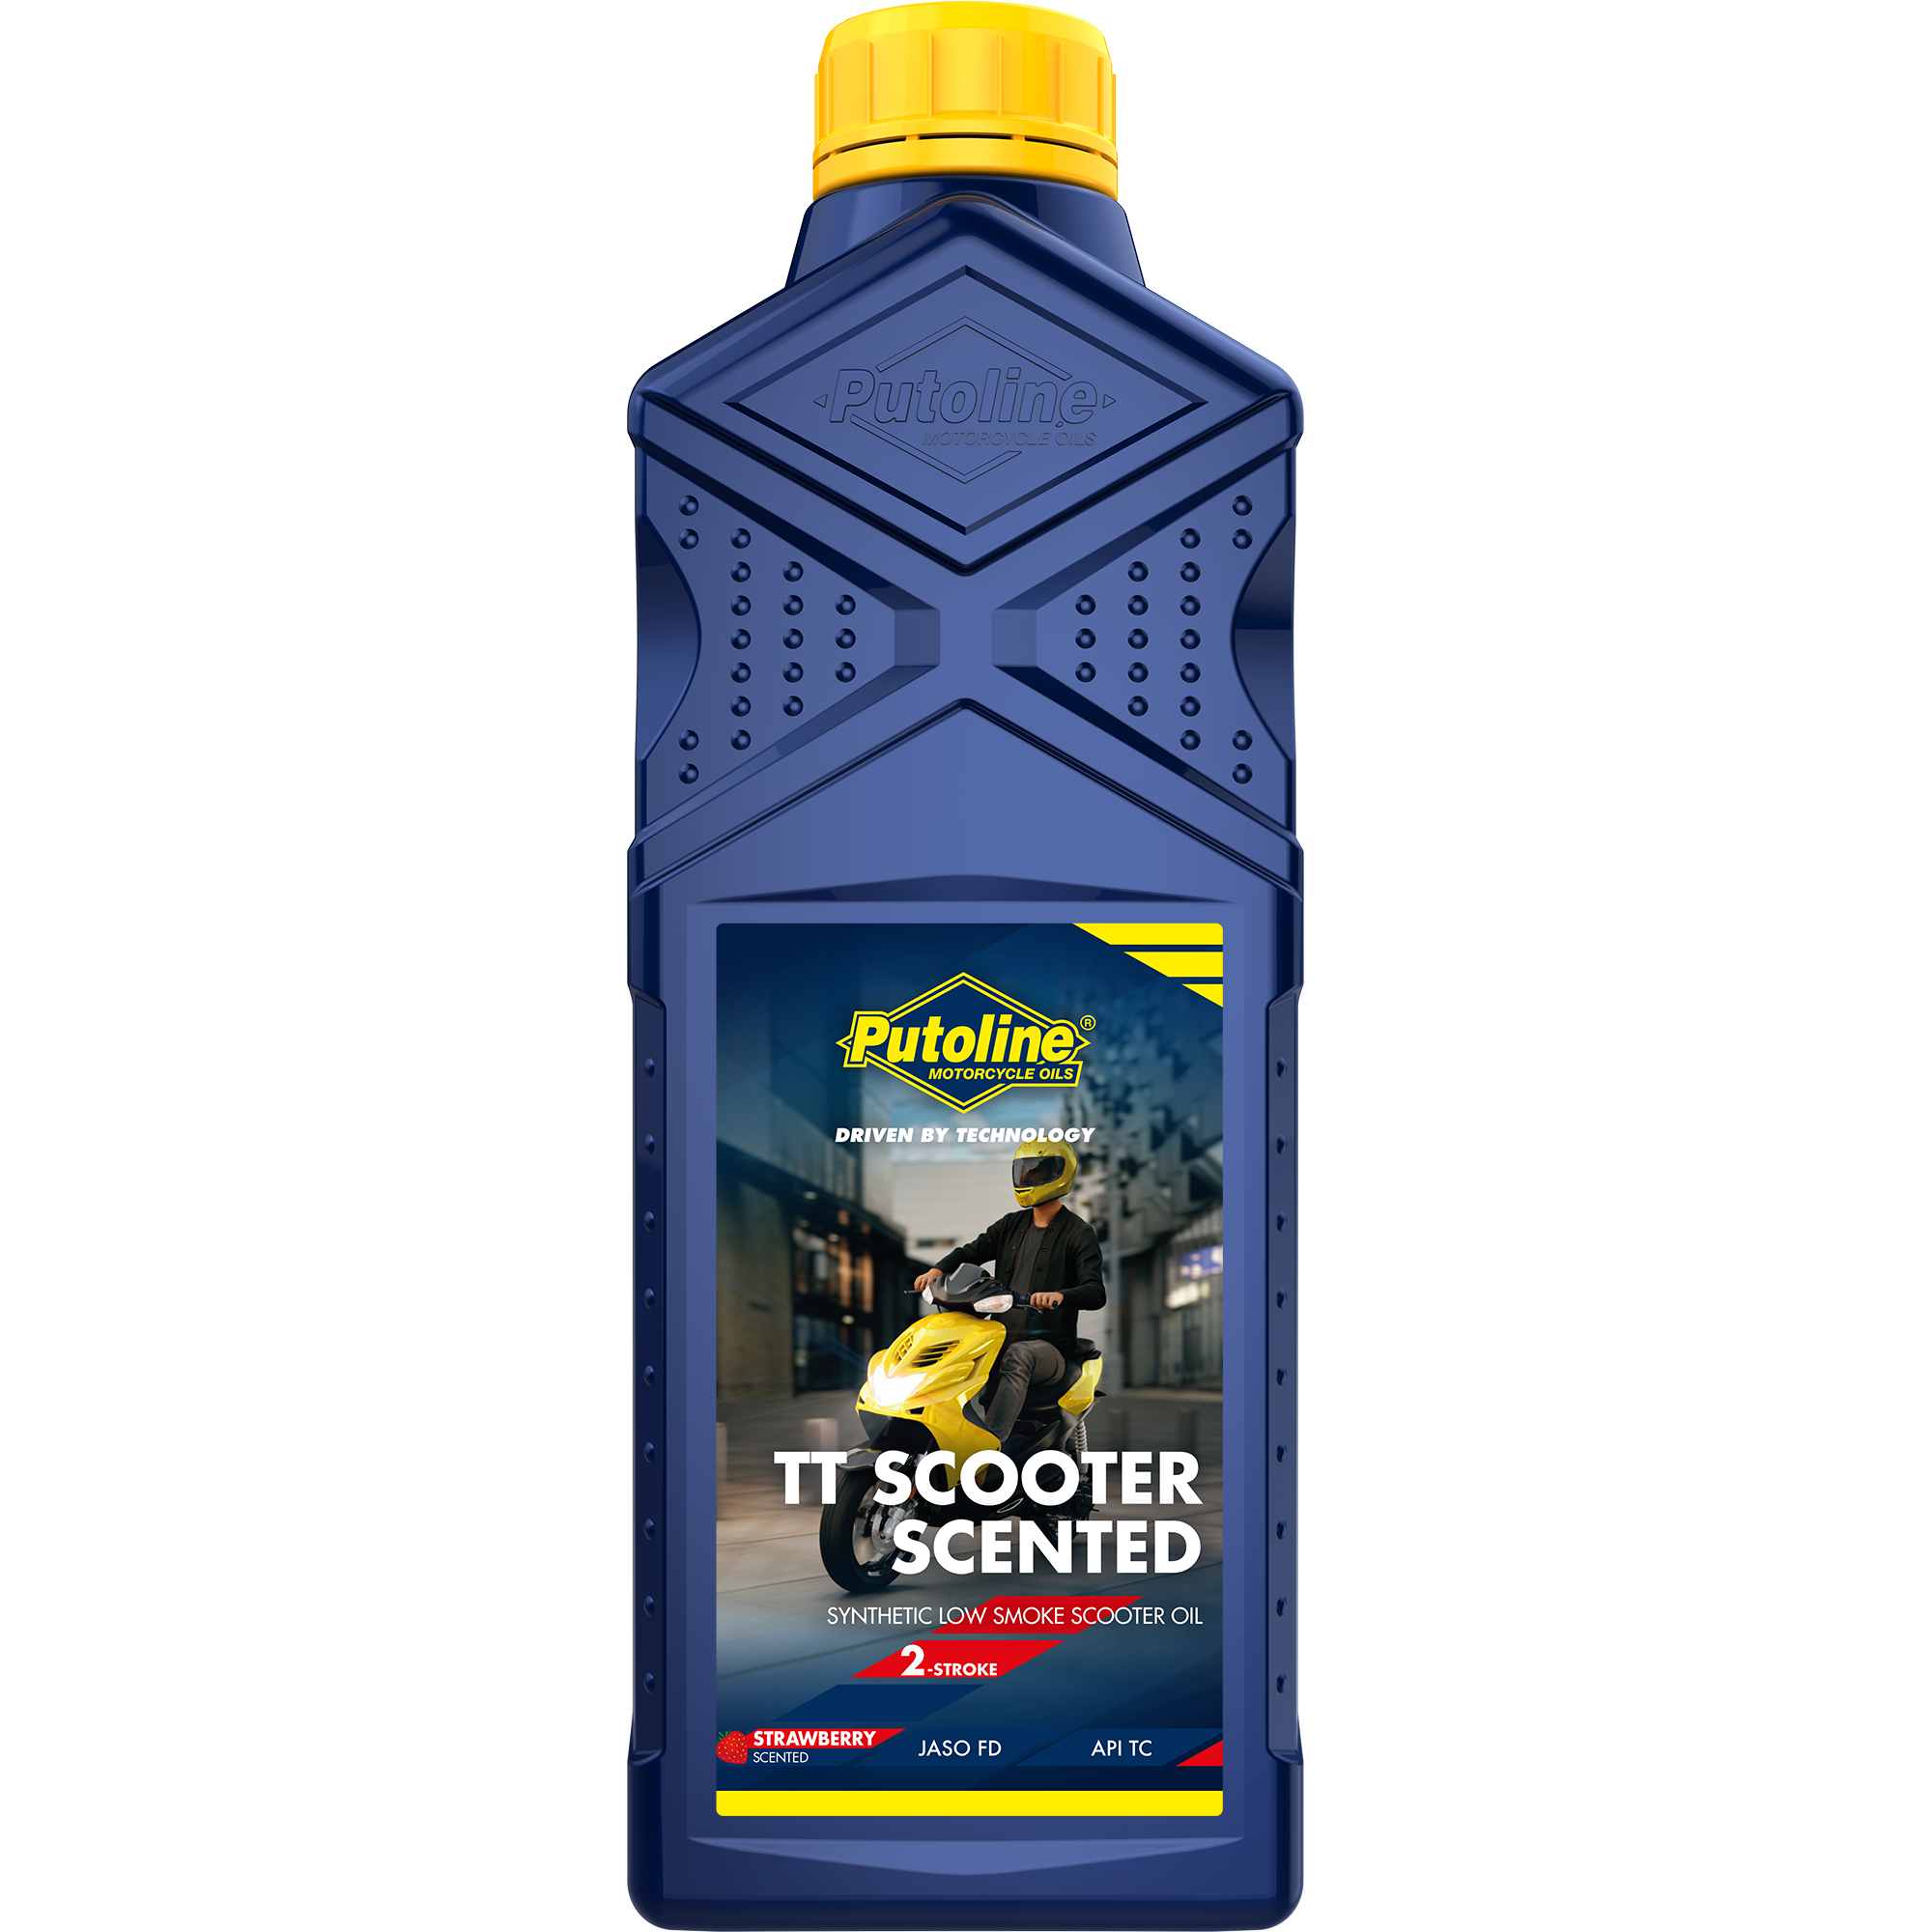 Putoline Motoröl TT Scooter Scented 1L